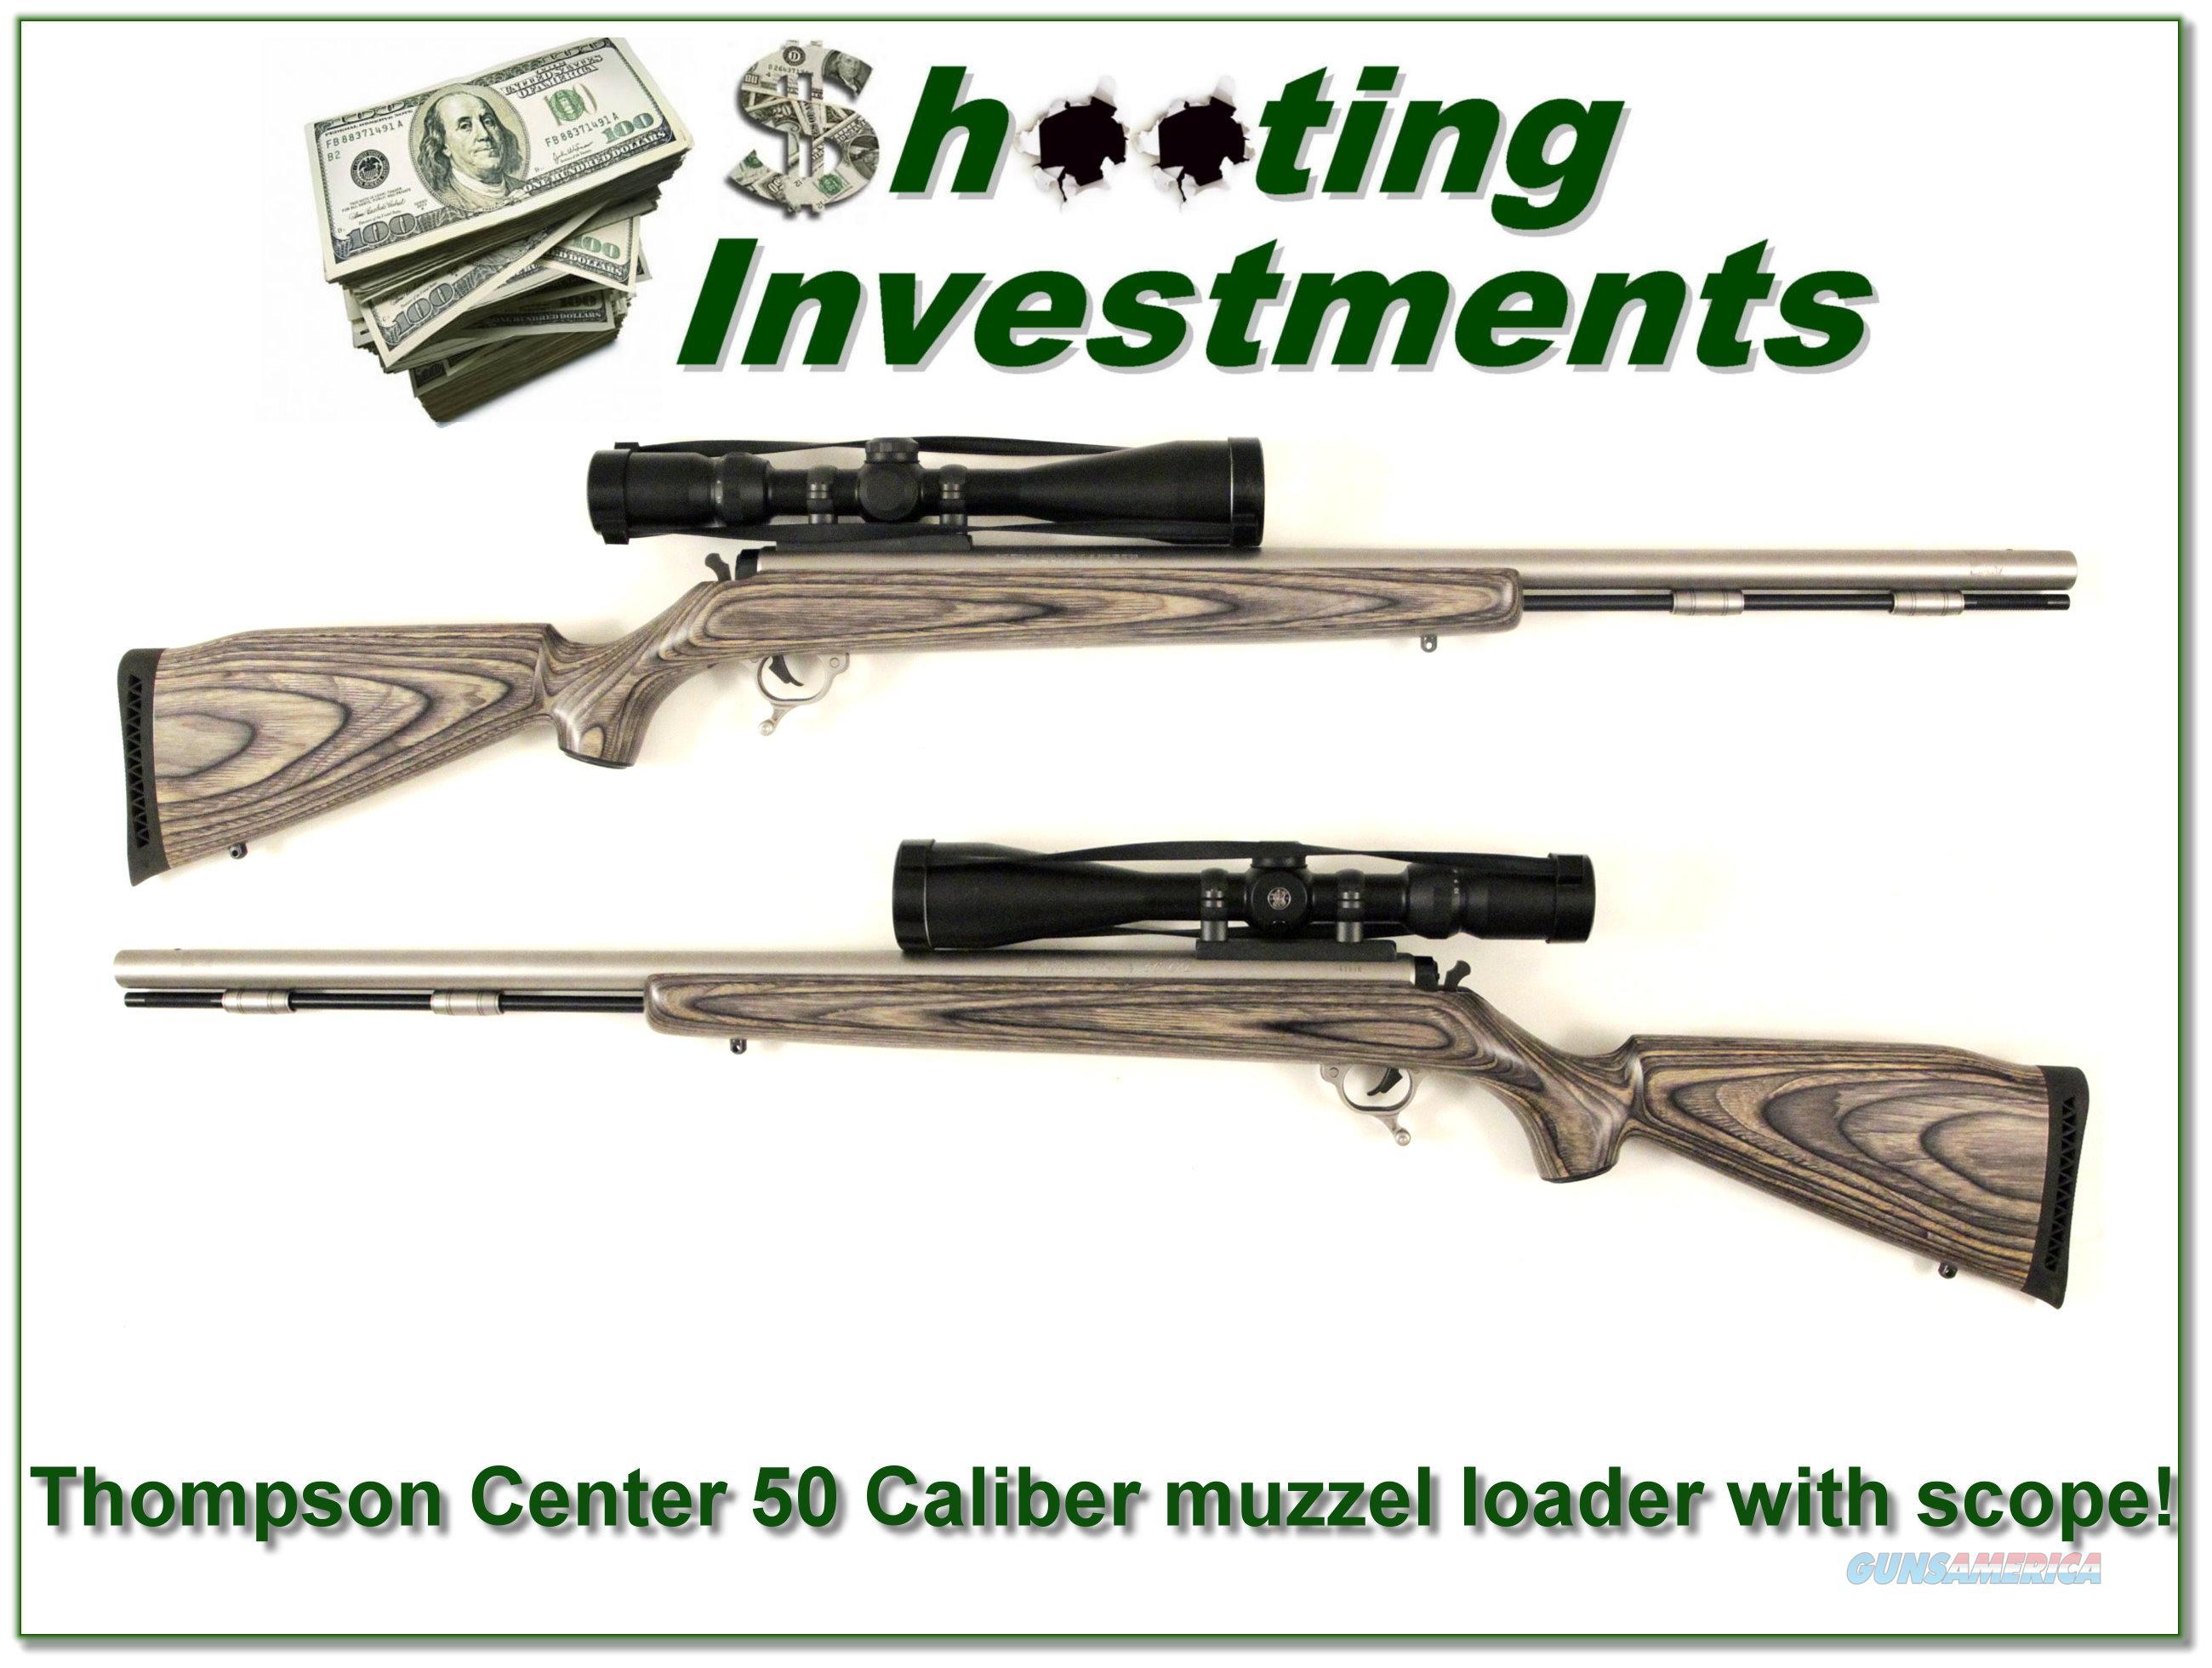 Thompson Center Omega X7 Black Powder Rifle 50 Caliber